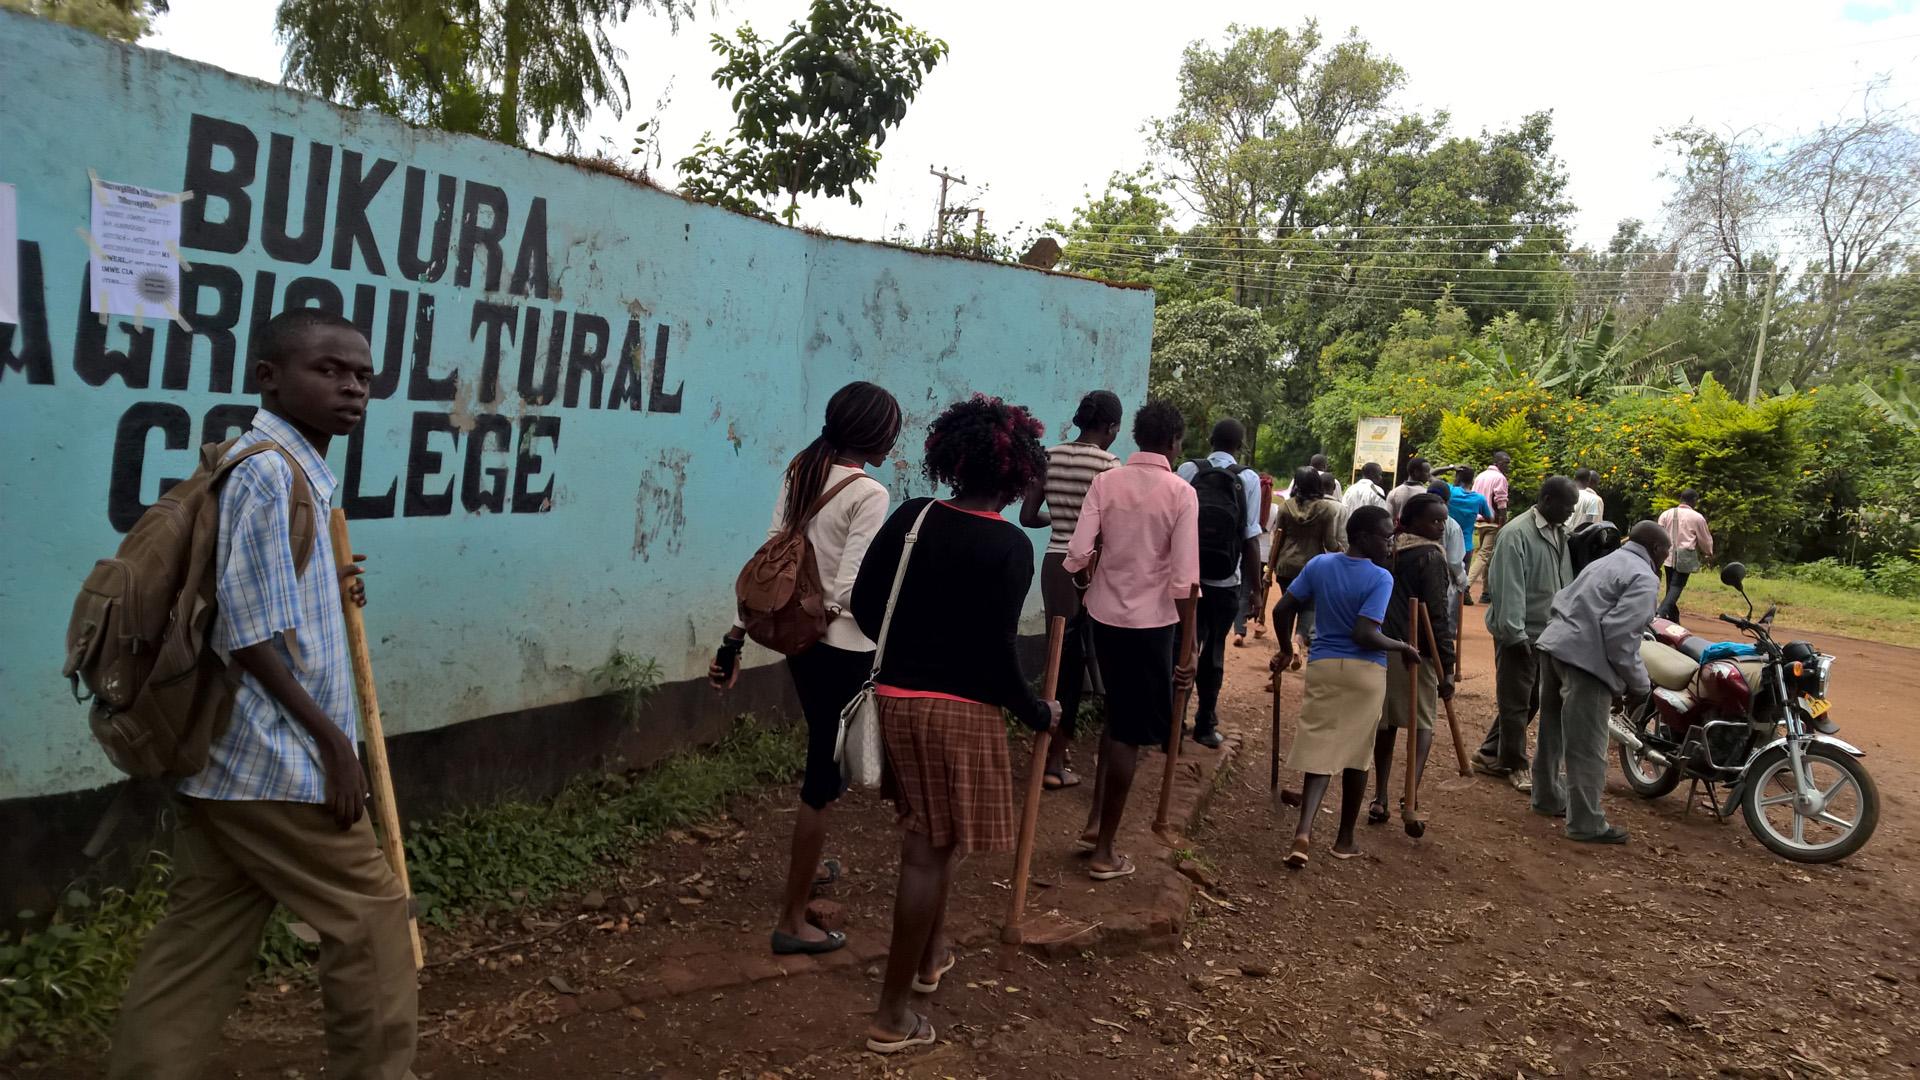 Grünes Innovationszentrum Kenia am Bukura Agricultural College